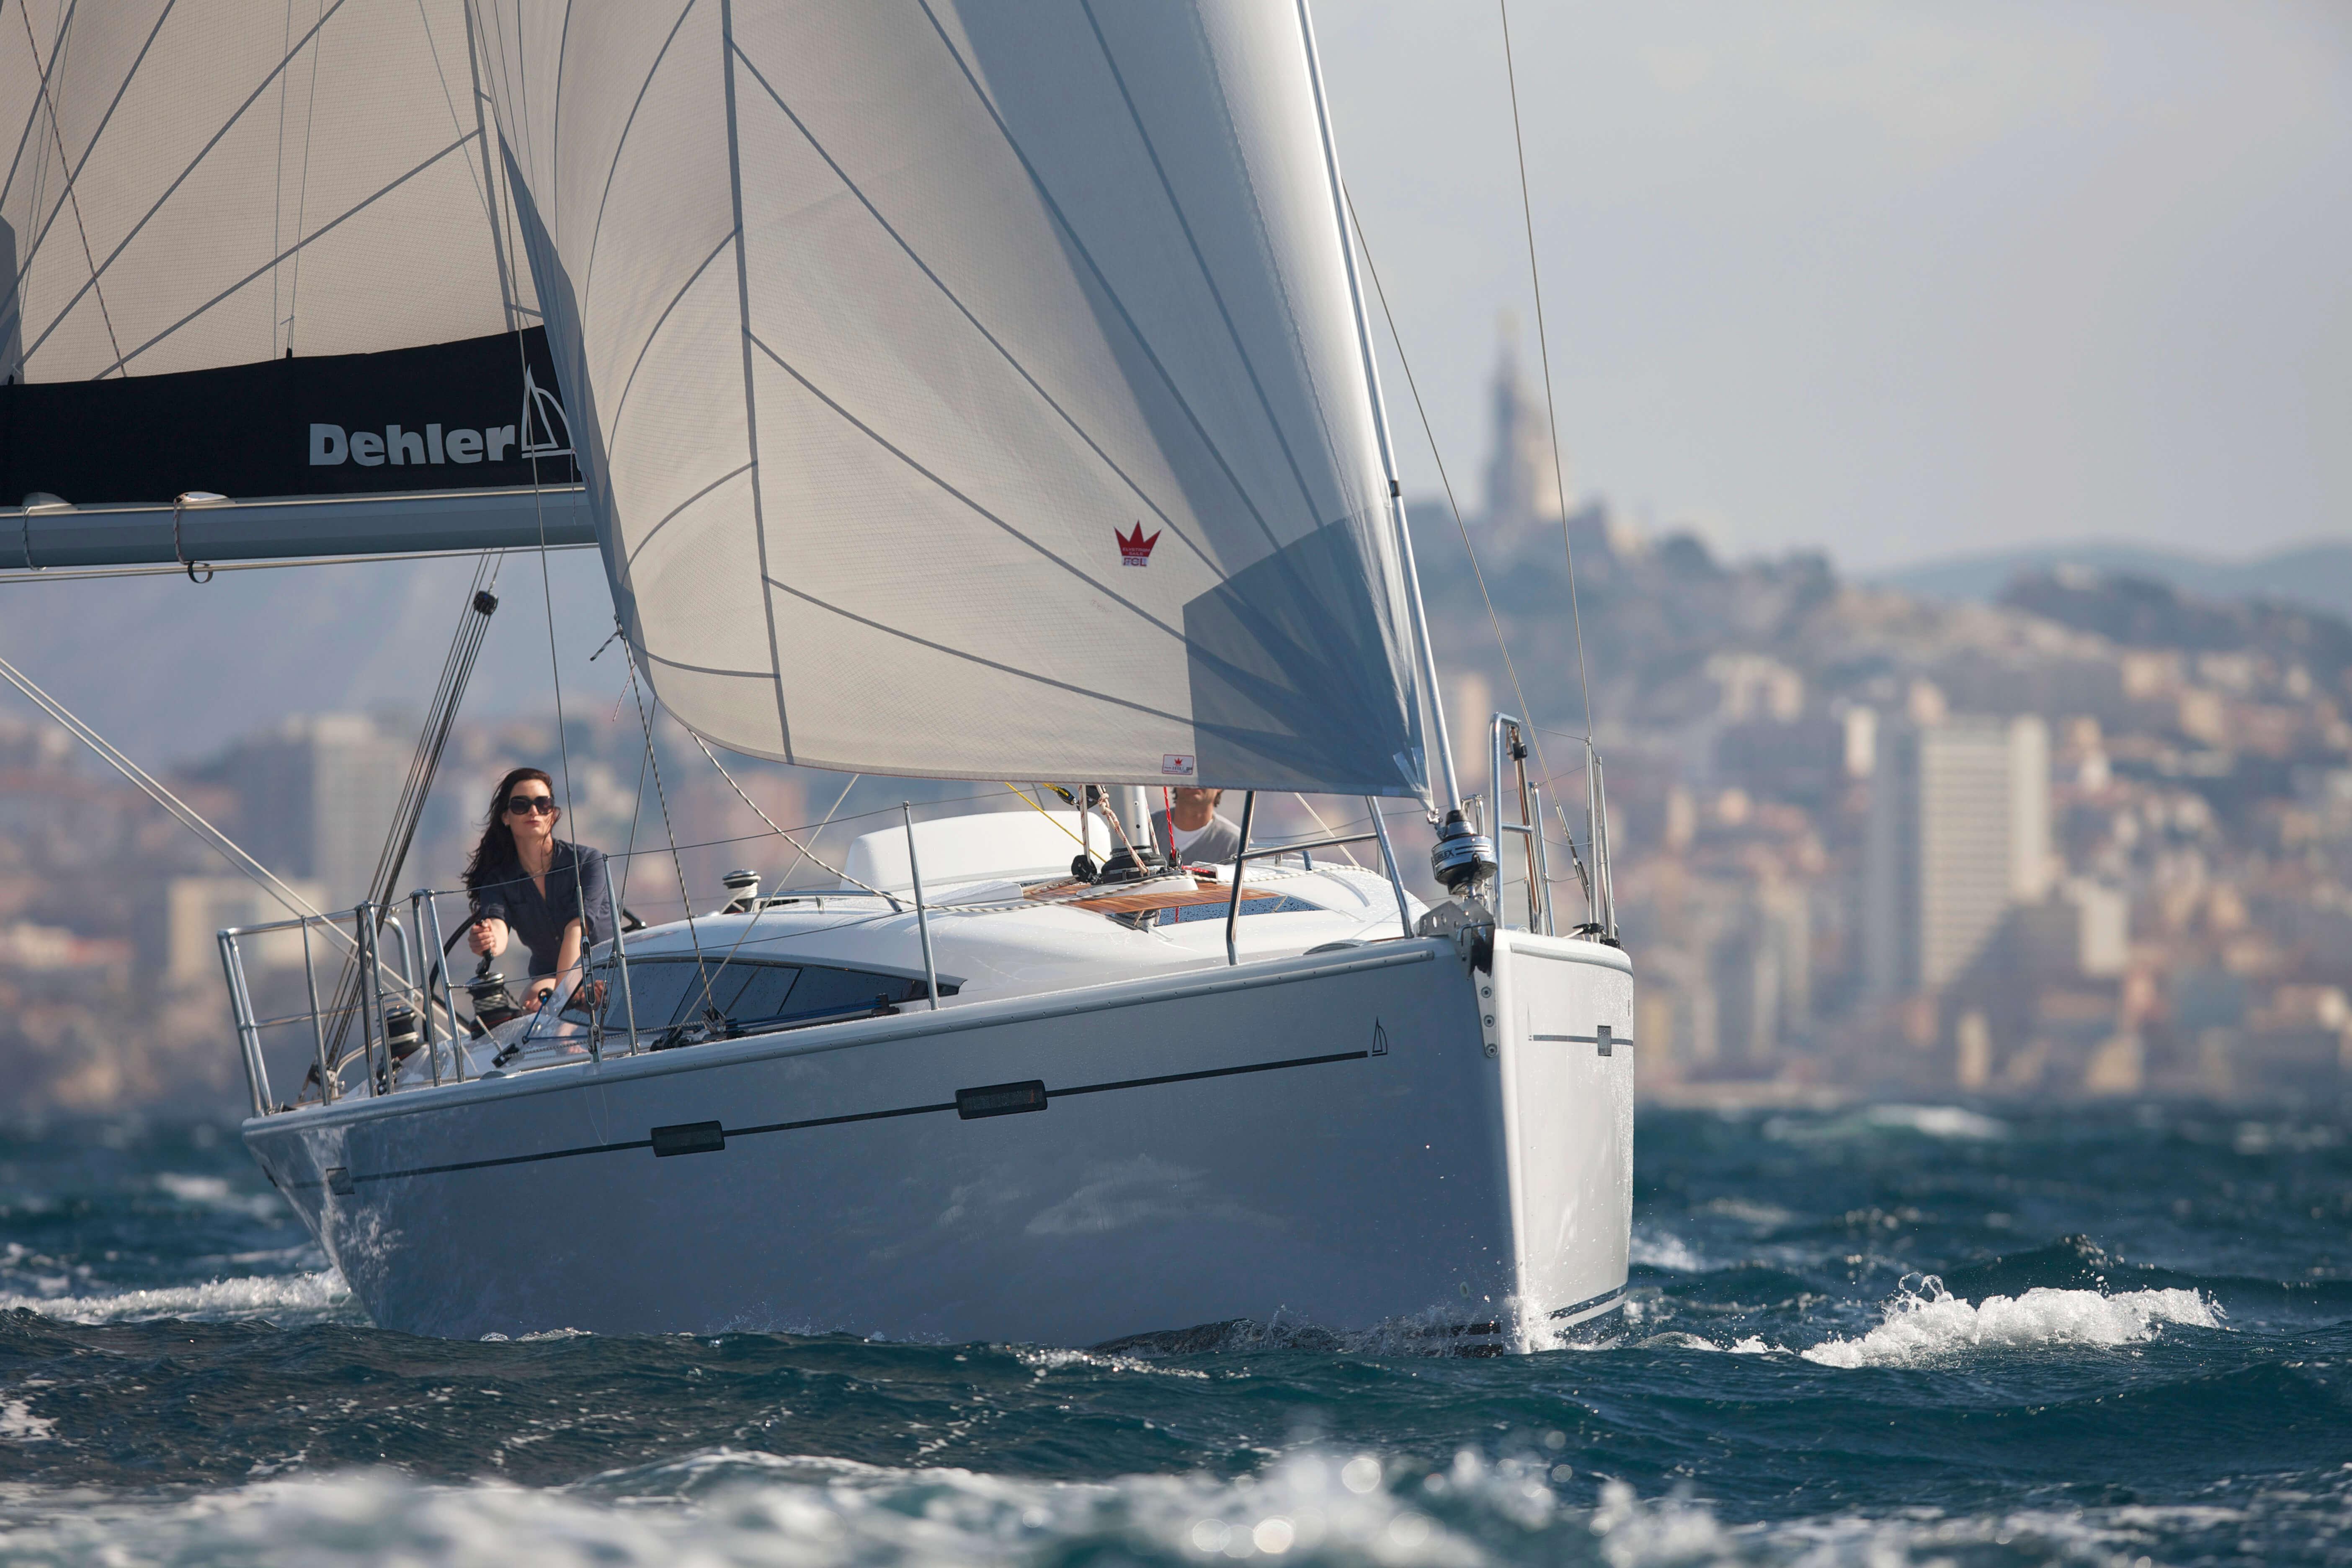 Dehler 38 Exterior Sailing | mainsail, foresail, bow | Dehler